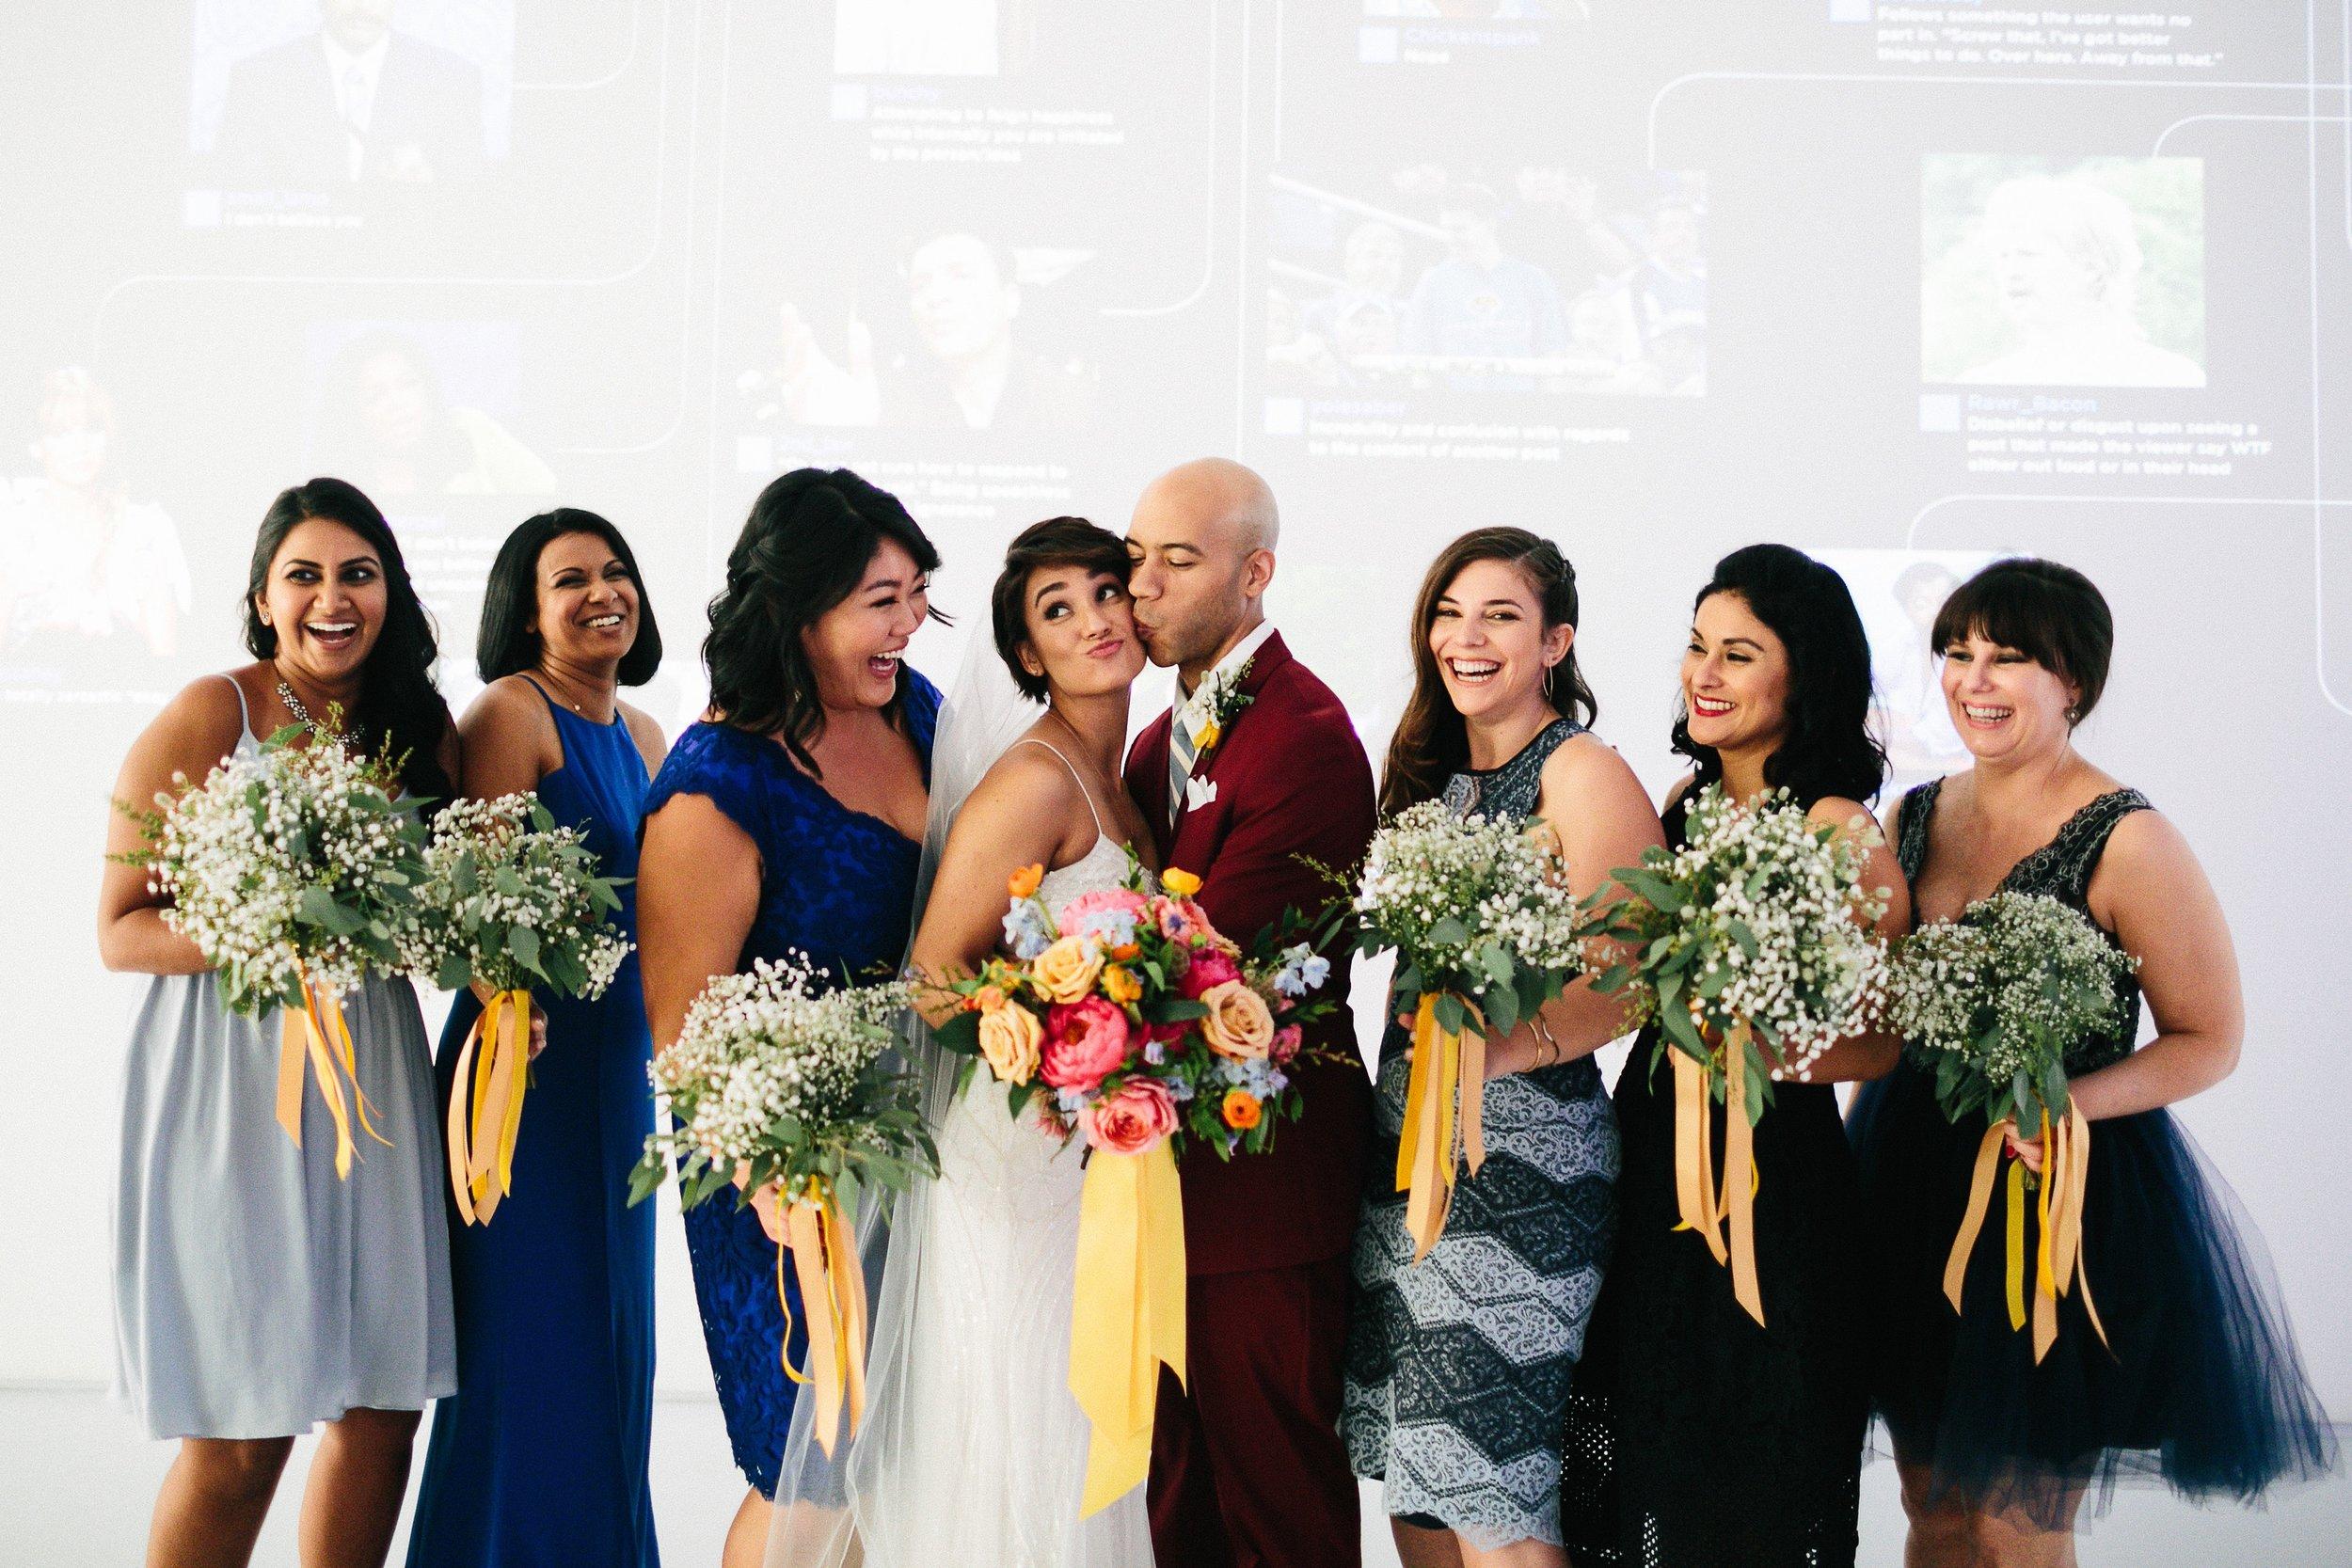 sachi rose florist moma wedding